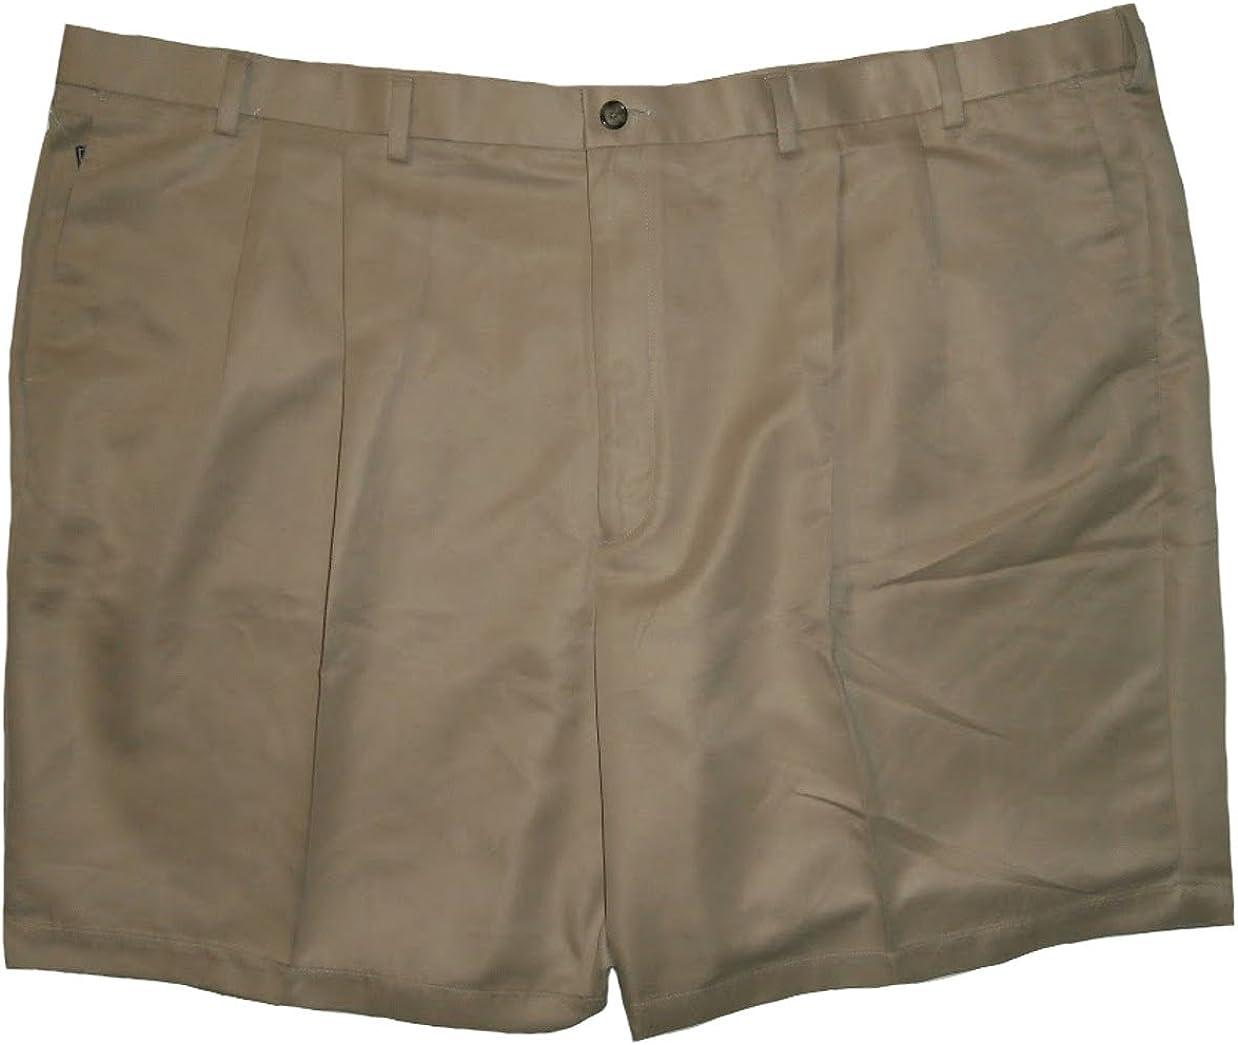 Roundtree & Yorke Mens Big & Tall Khaki Shorts Expander 400BT Polyester